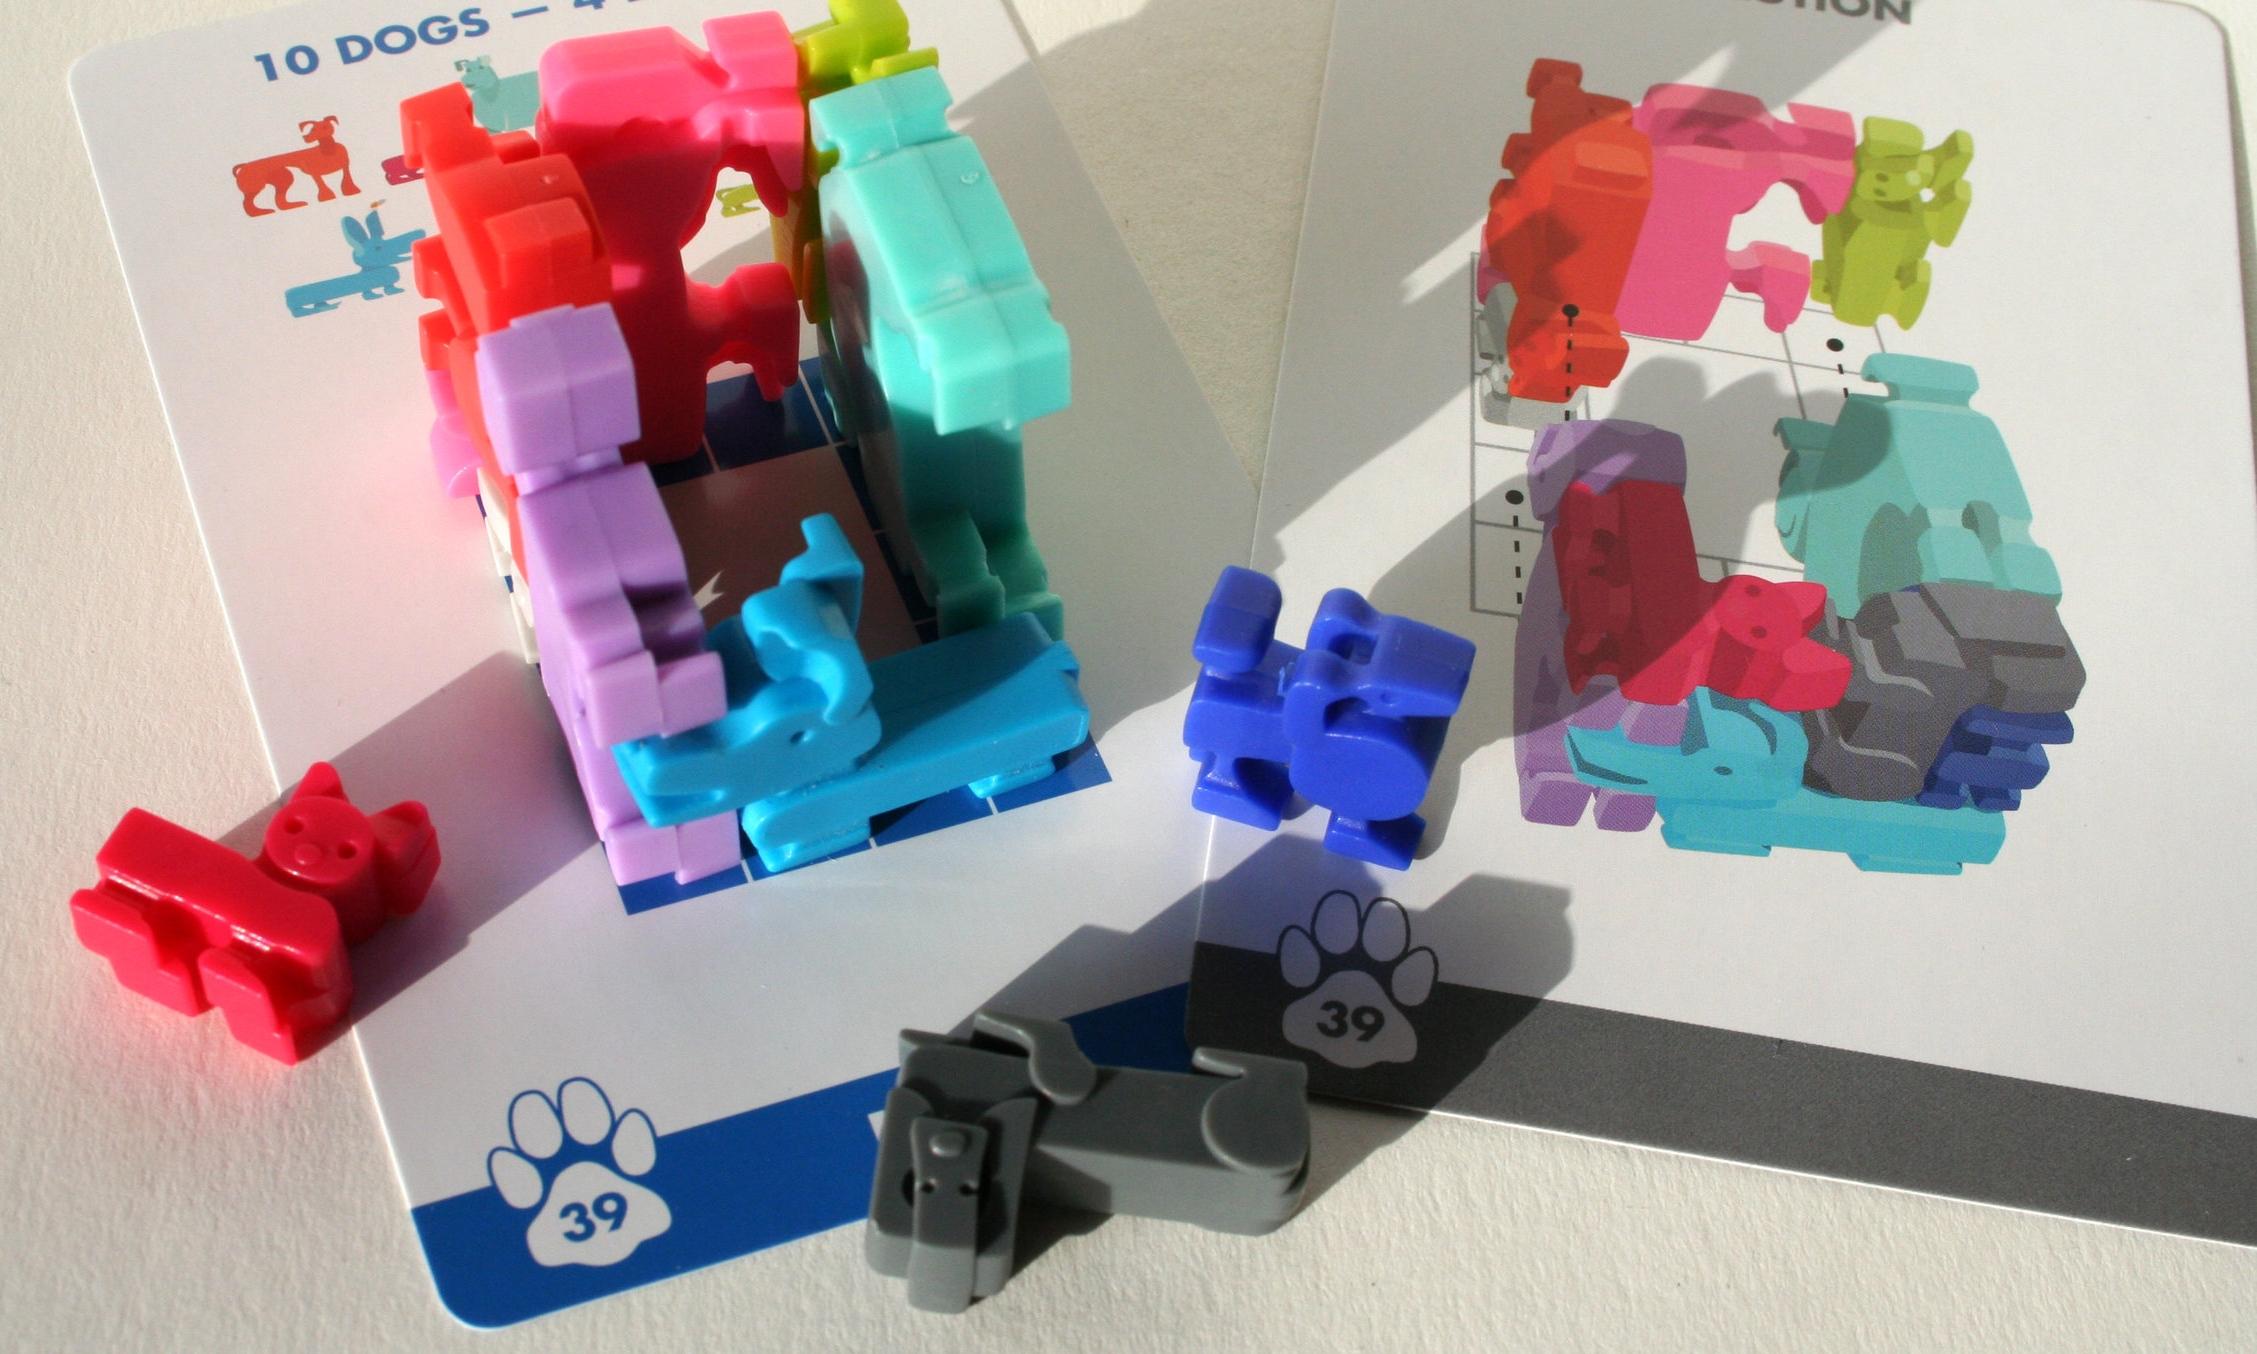 dogpile puzzle 2 copy.JPG